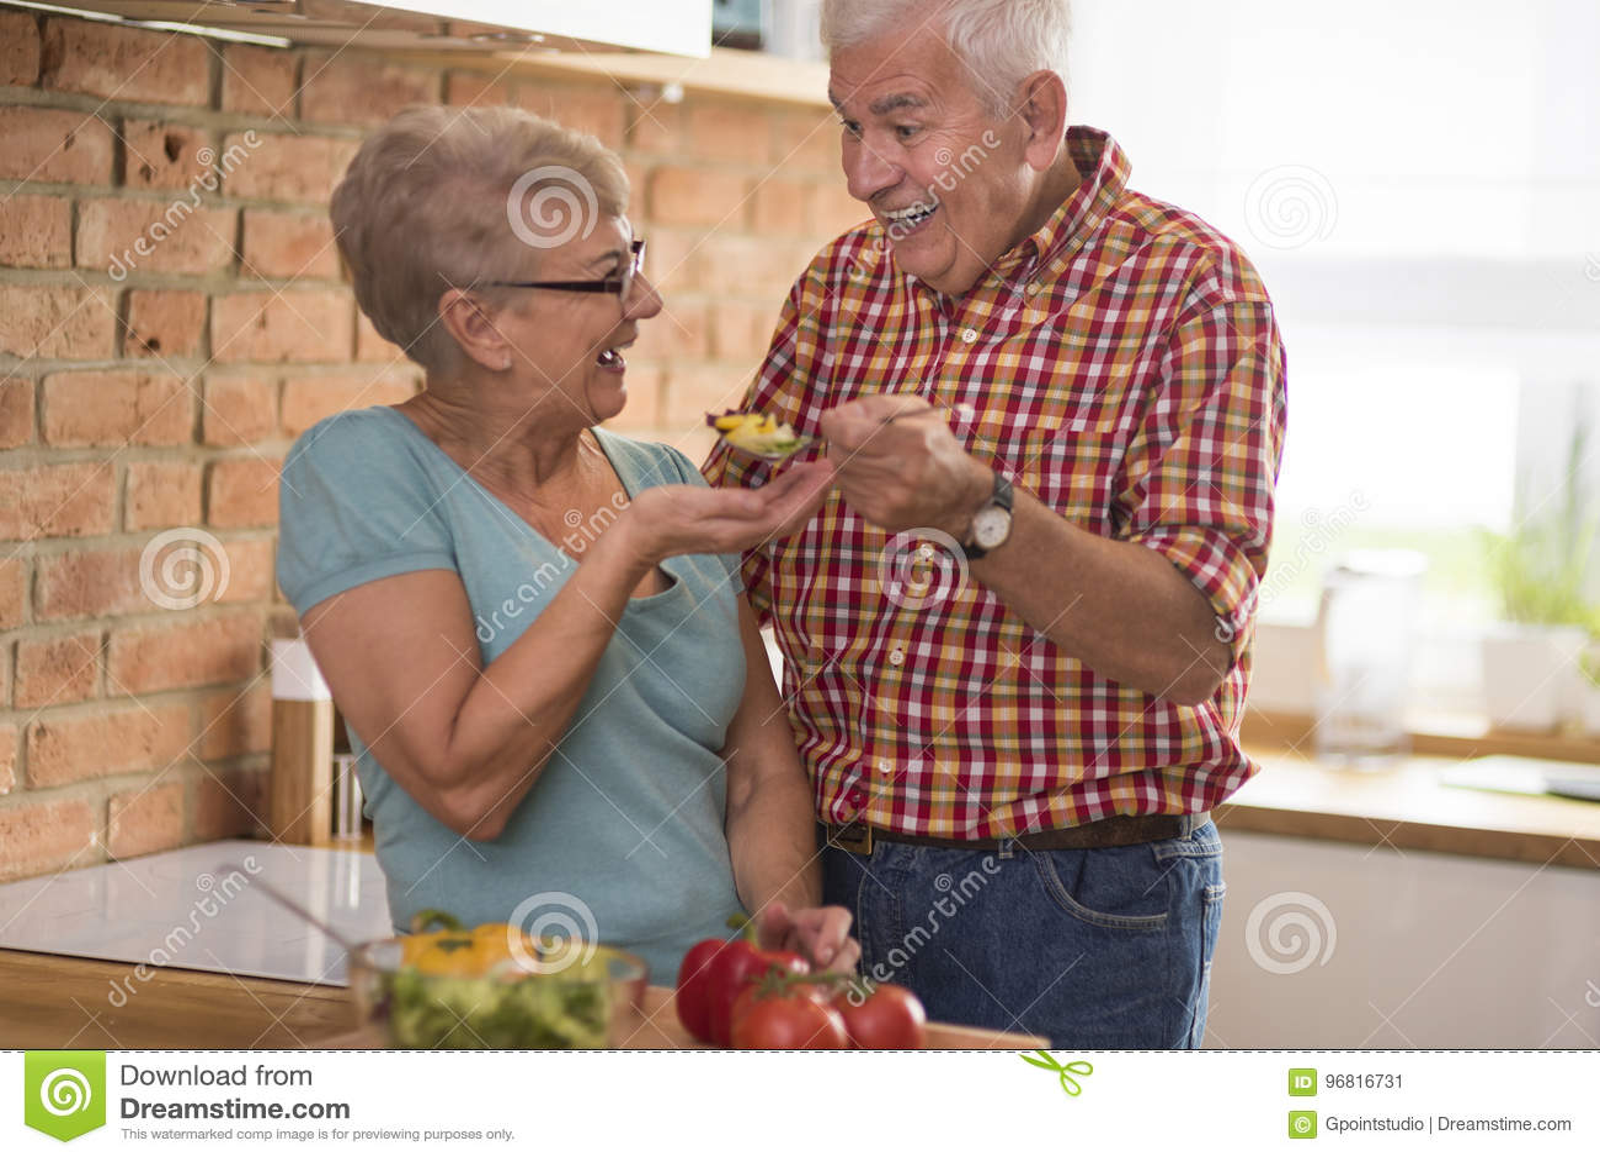 Senior couple at the kitchen